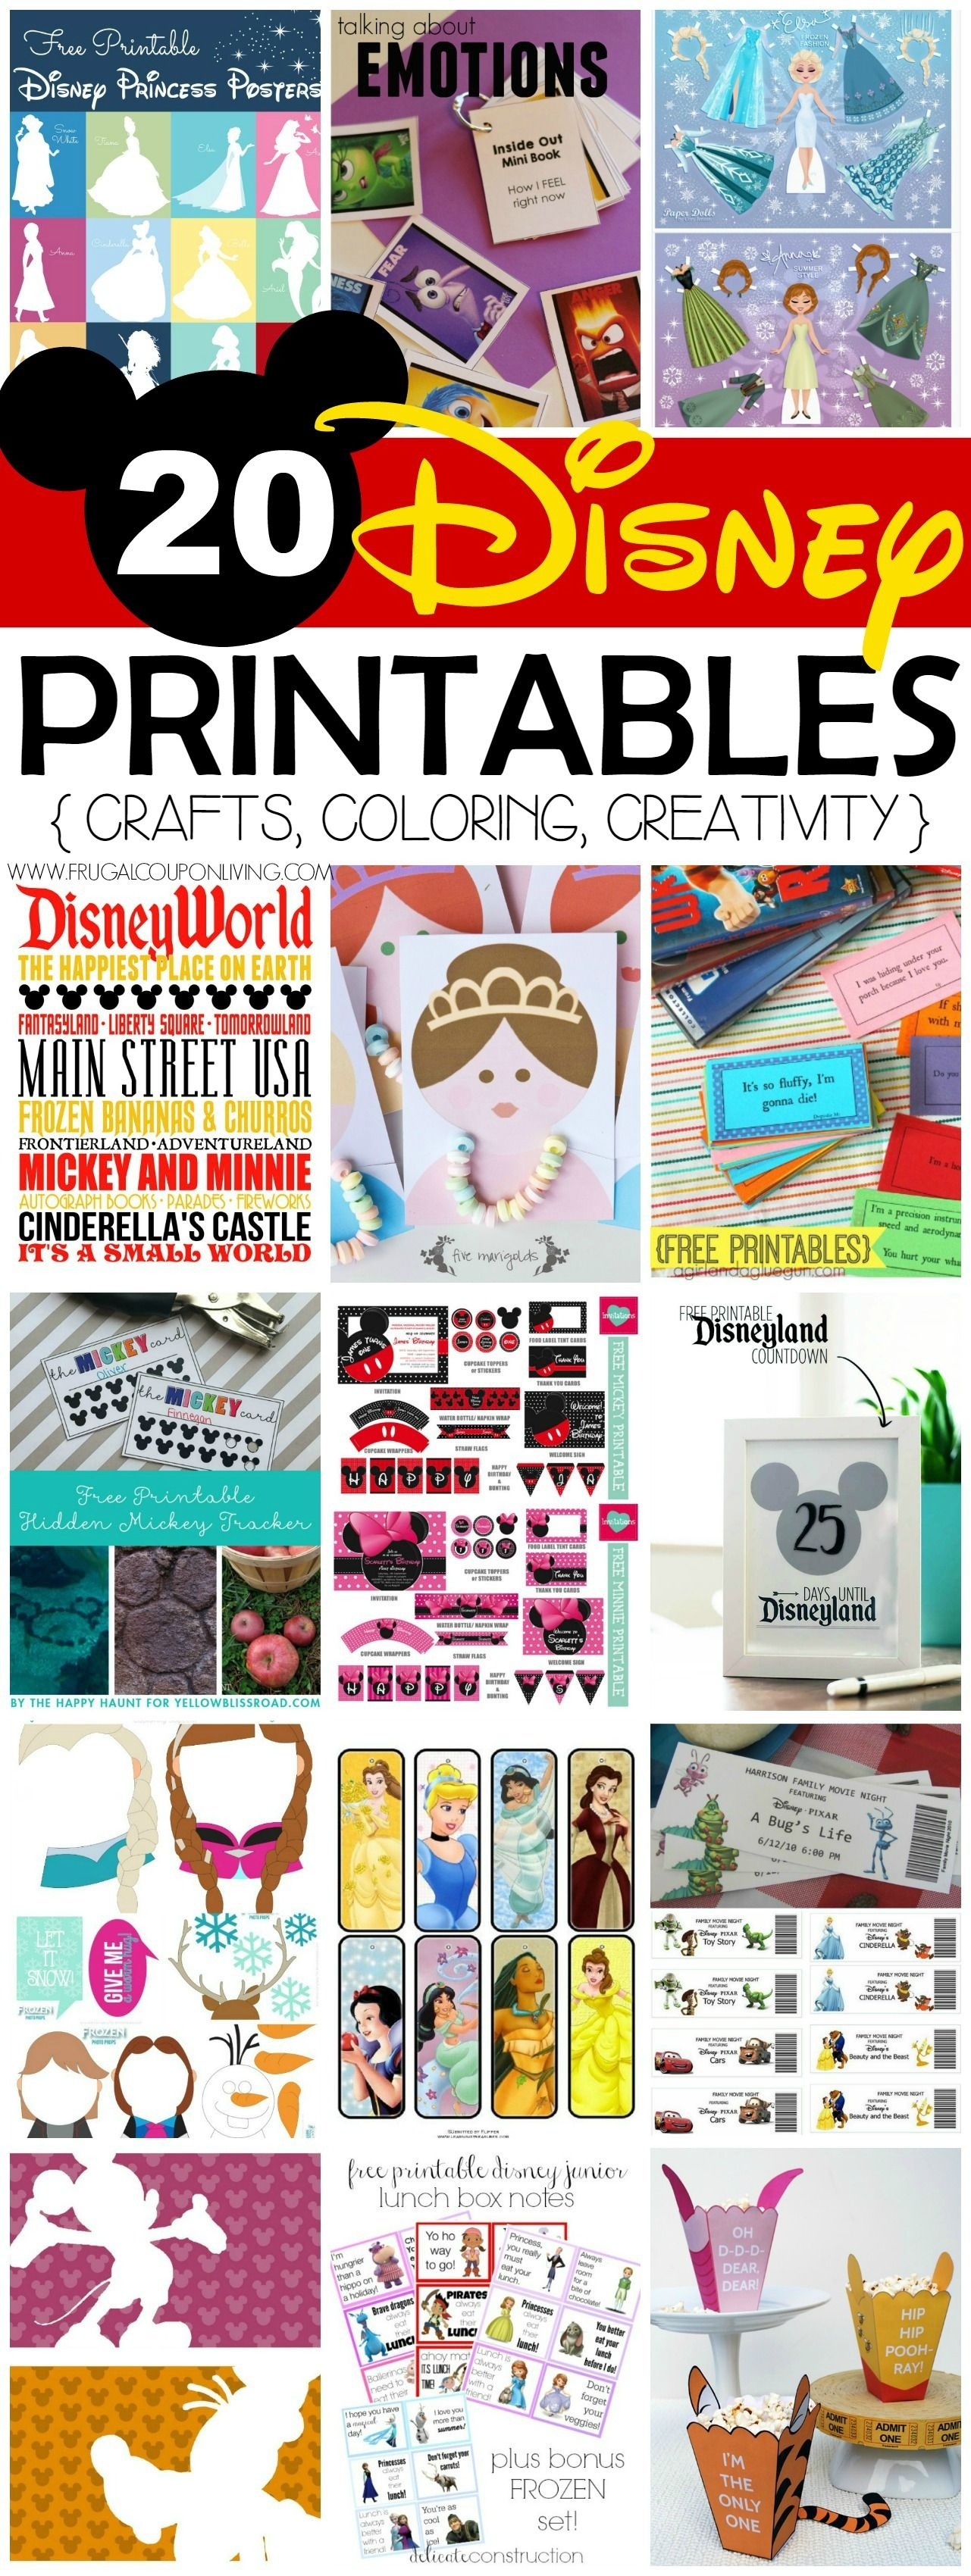 20 Free Disney Printables - Crafts, Coloring, Creativity | Disney - Free Printable Disney Stories